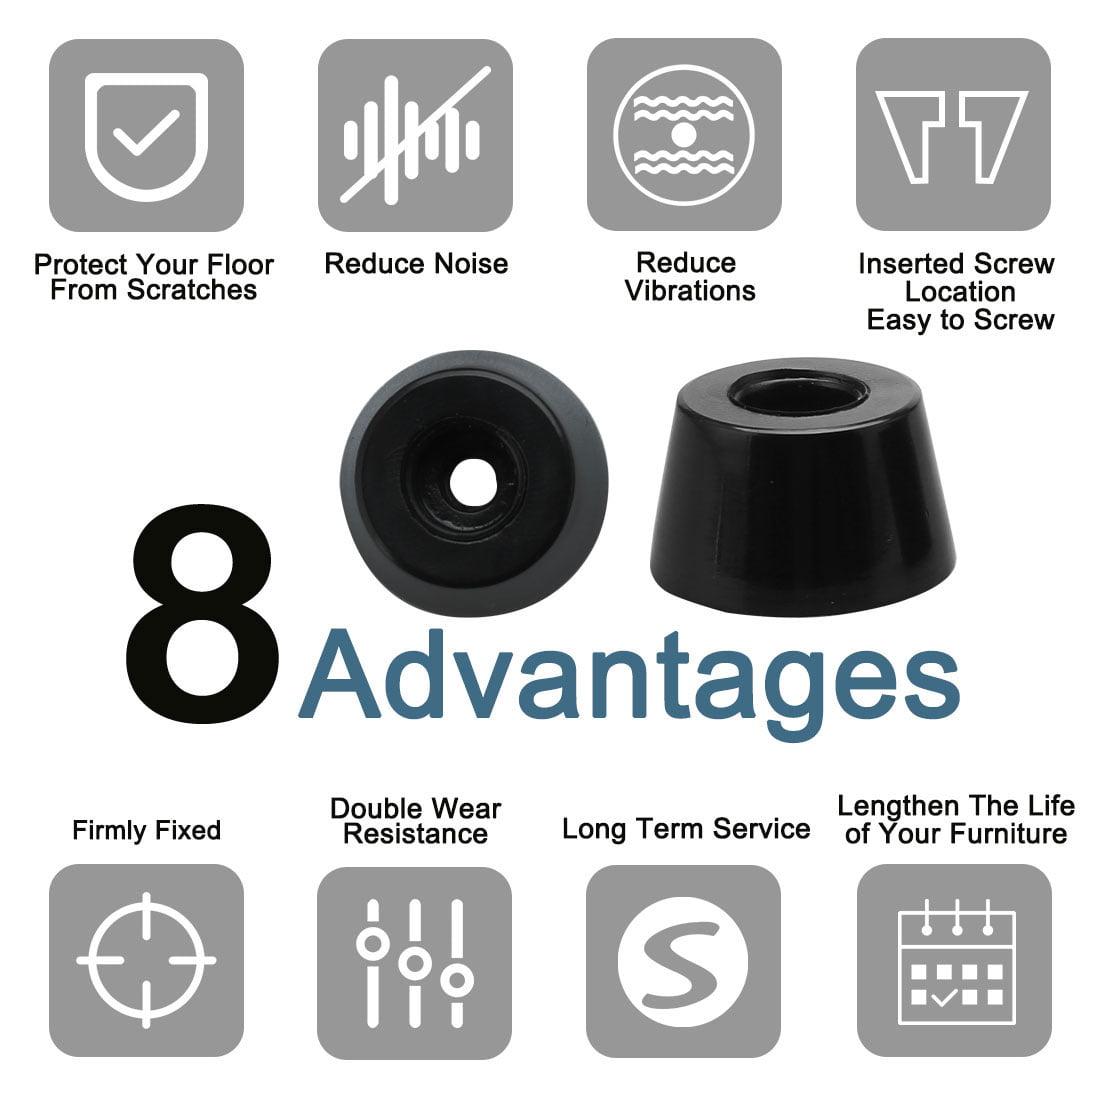 55pcs Rubber Feet Bumper Cabinet Amplifier Speaker Desk Leg Pads, D21x17xH12mm - image 5 de 7